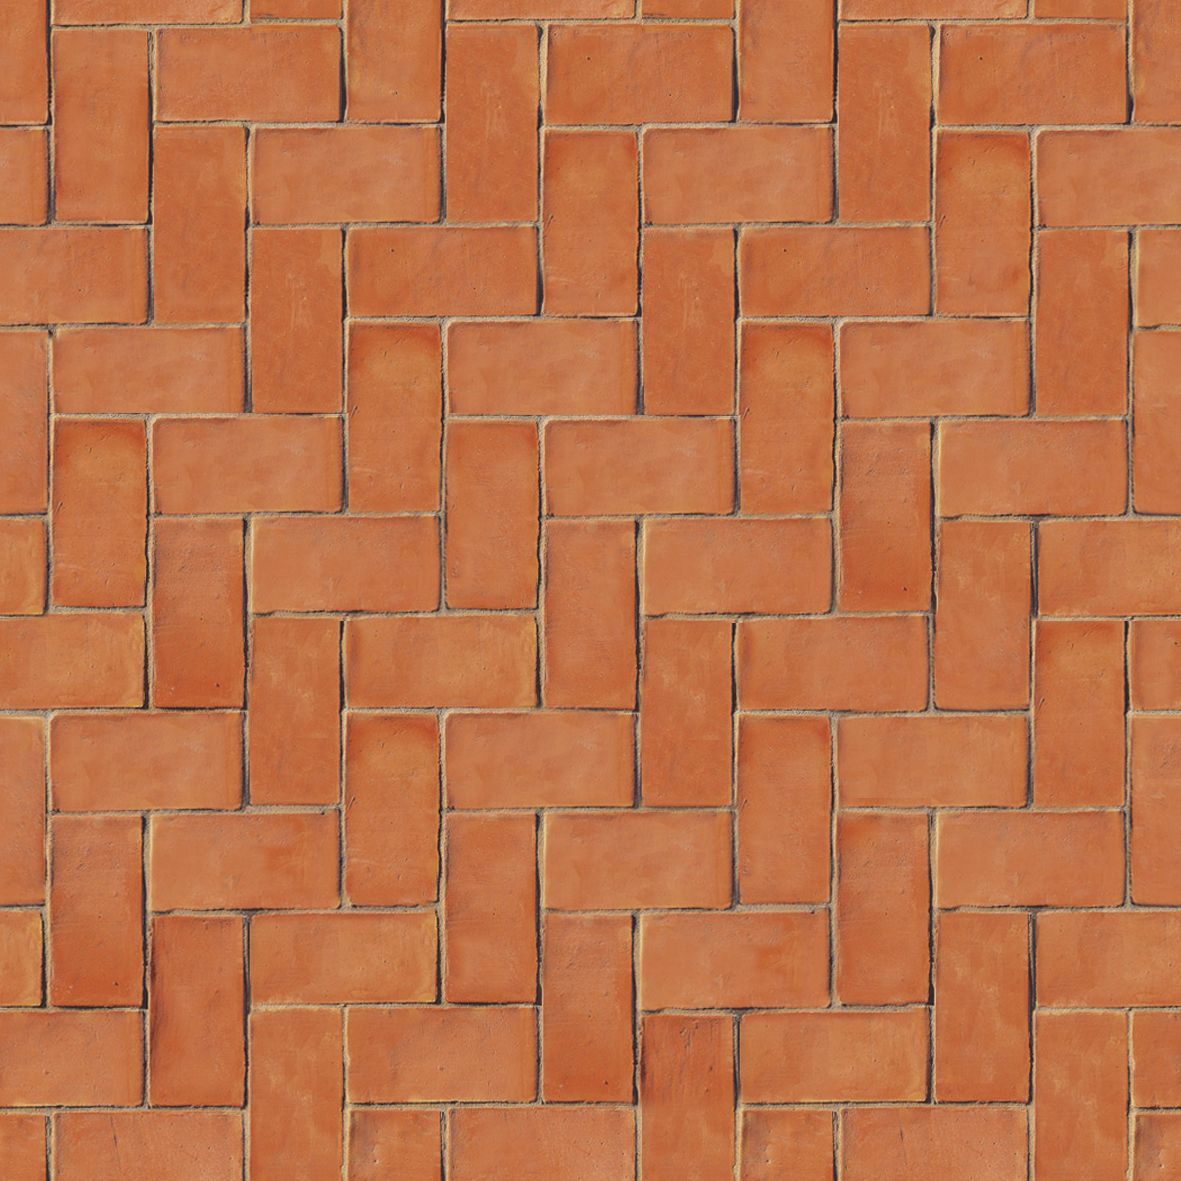 Terracotta Floor Tiles Texture Pisos textura, Muros de